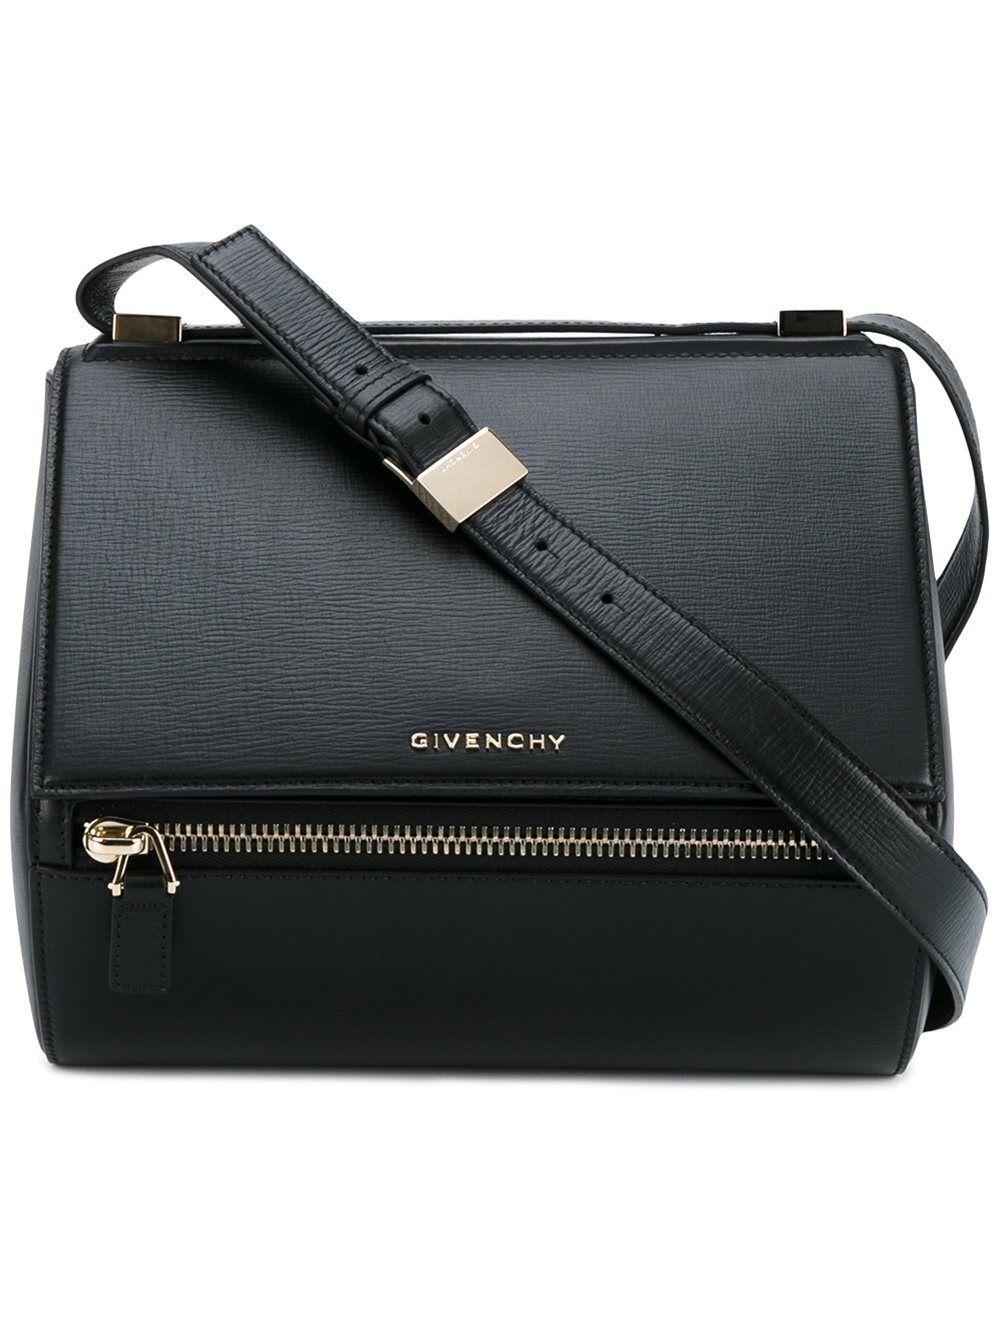 87d7cd75f15 Givenchy Pandora Box shoulder bag | Gucci Bags | Bags, Pandora bag ...